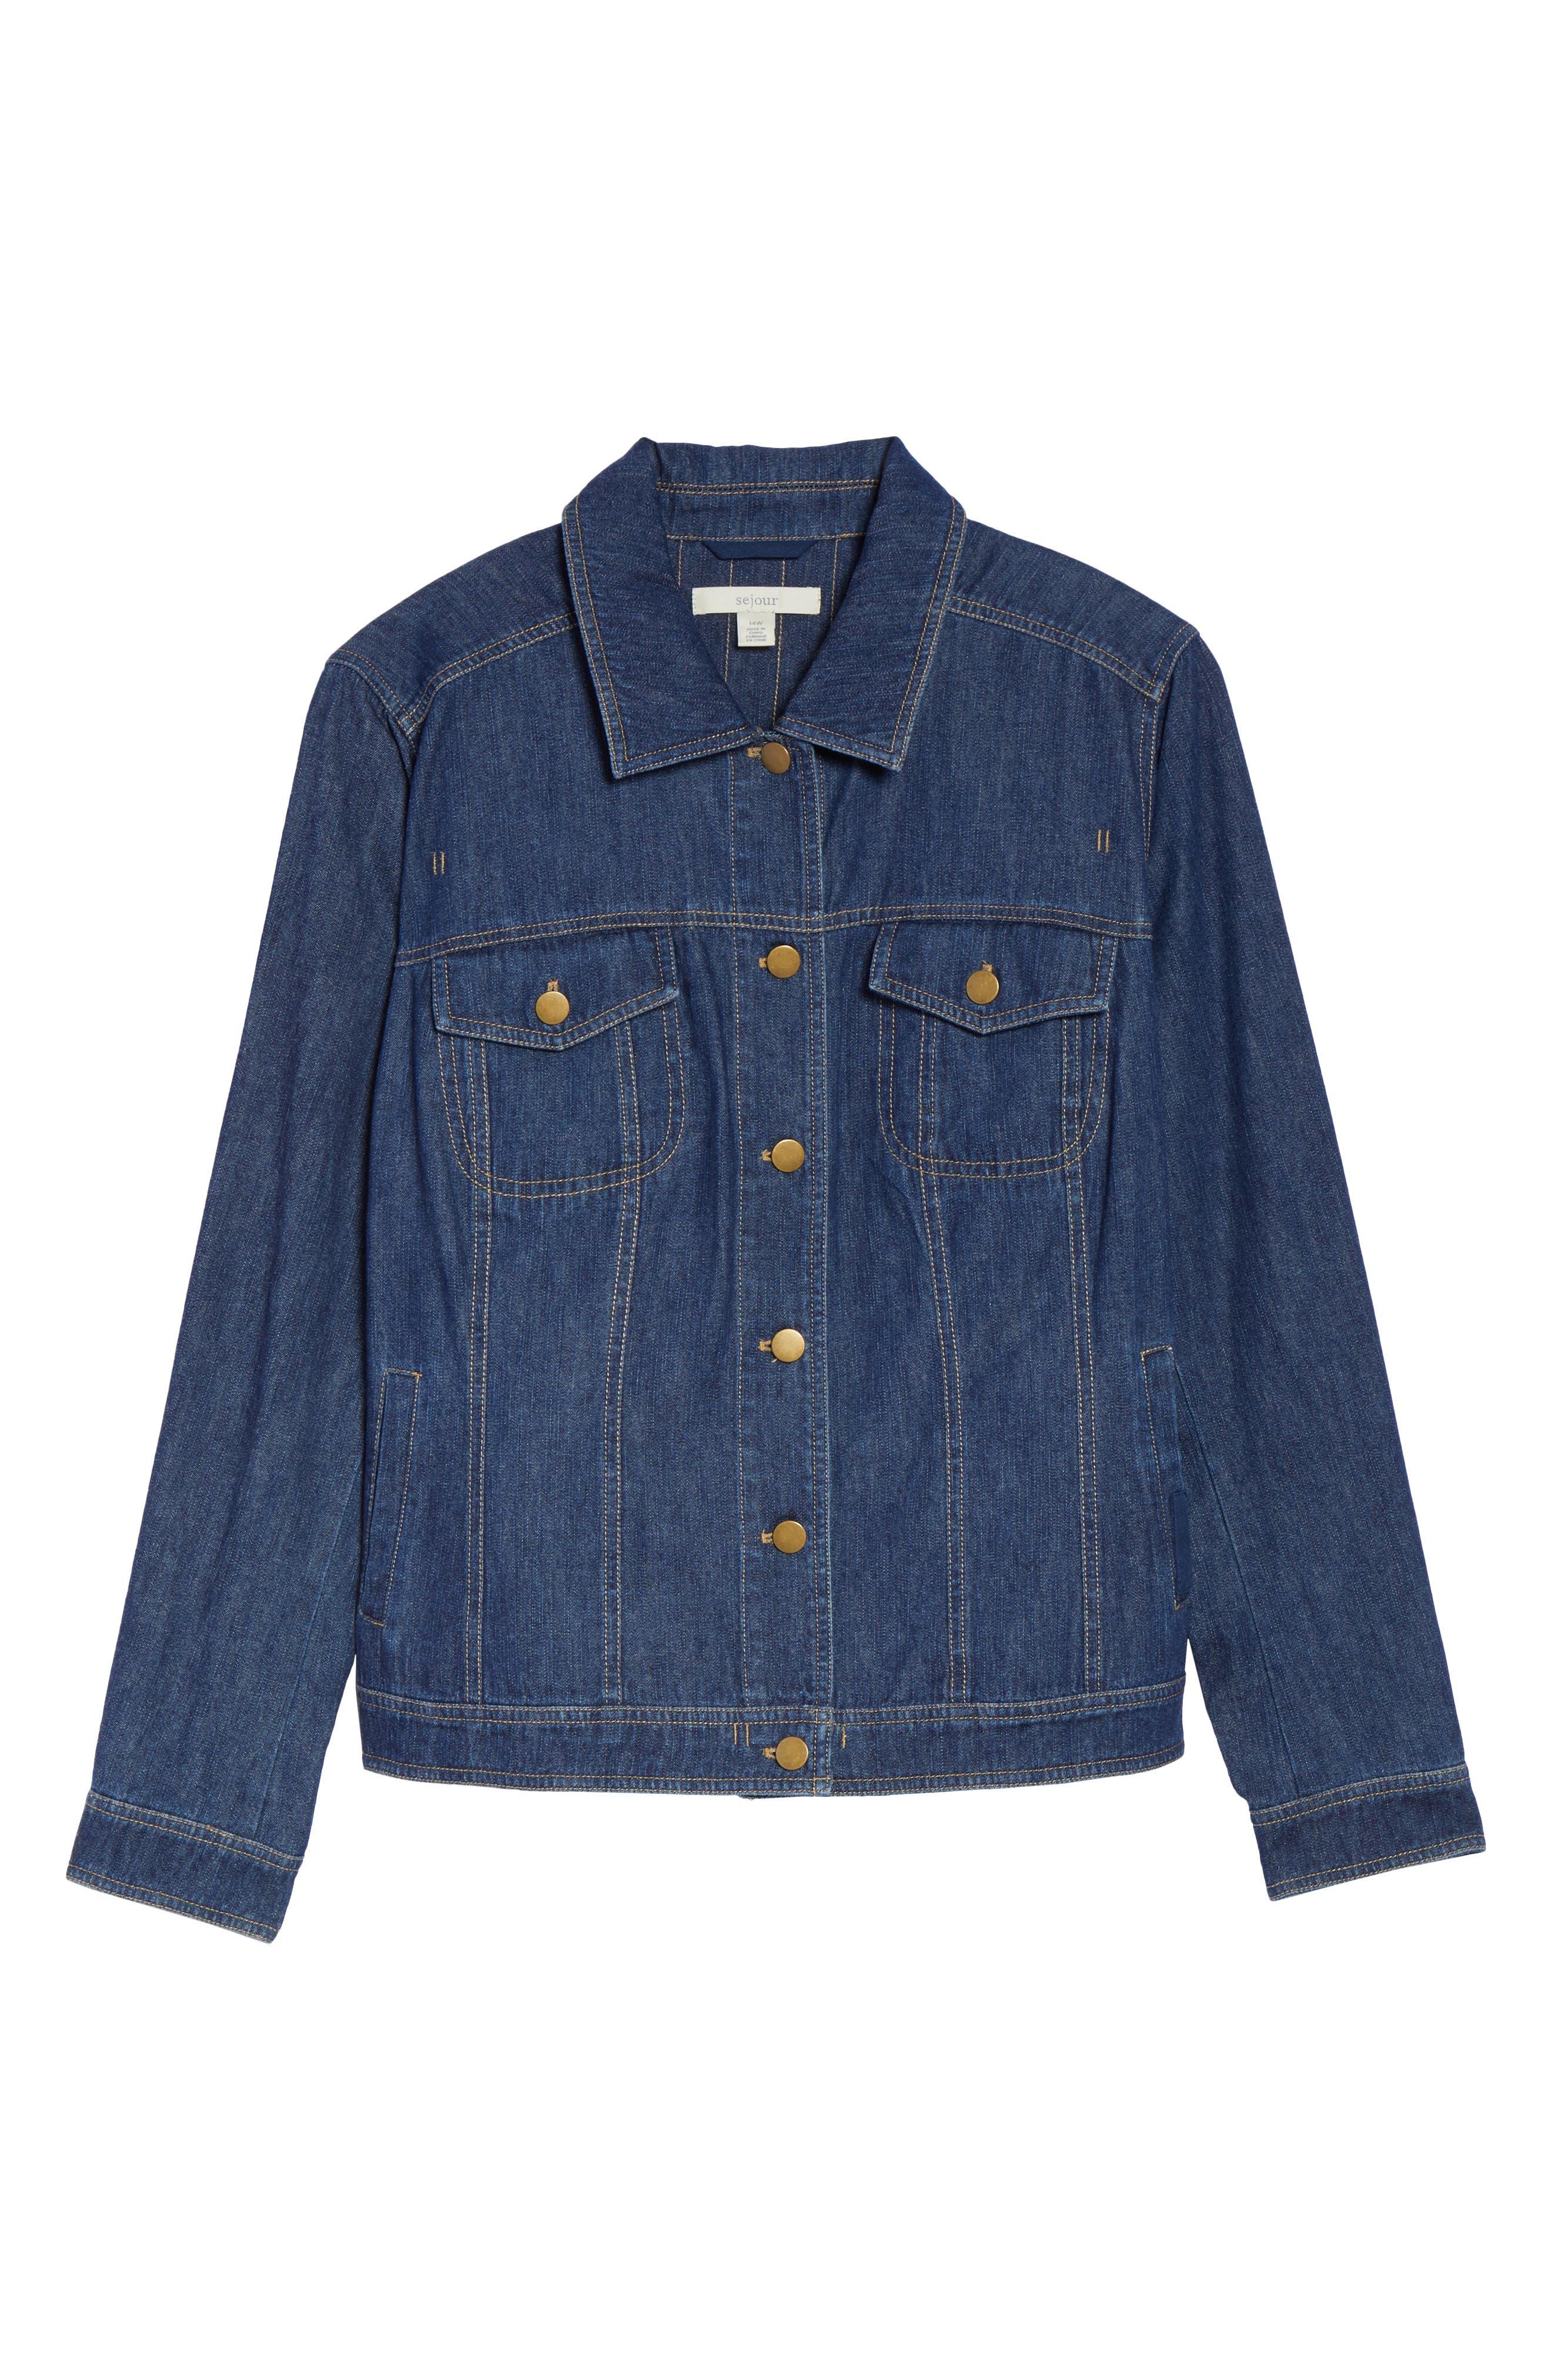 Denim Jacket,                             Alternate thumbnail 5, color,                             401